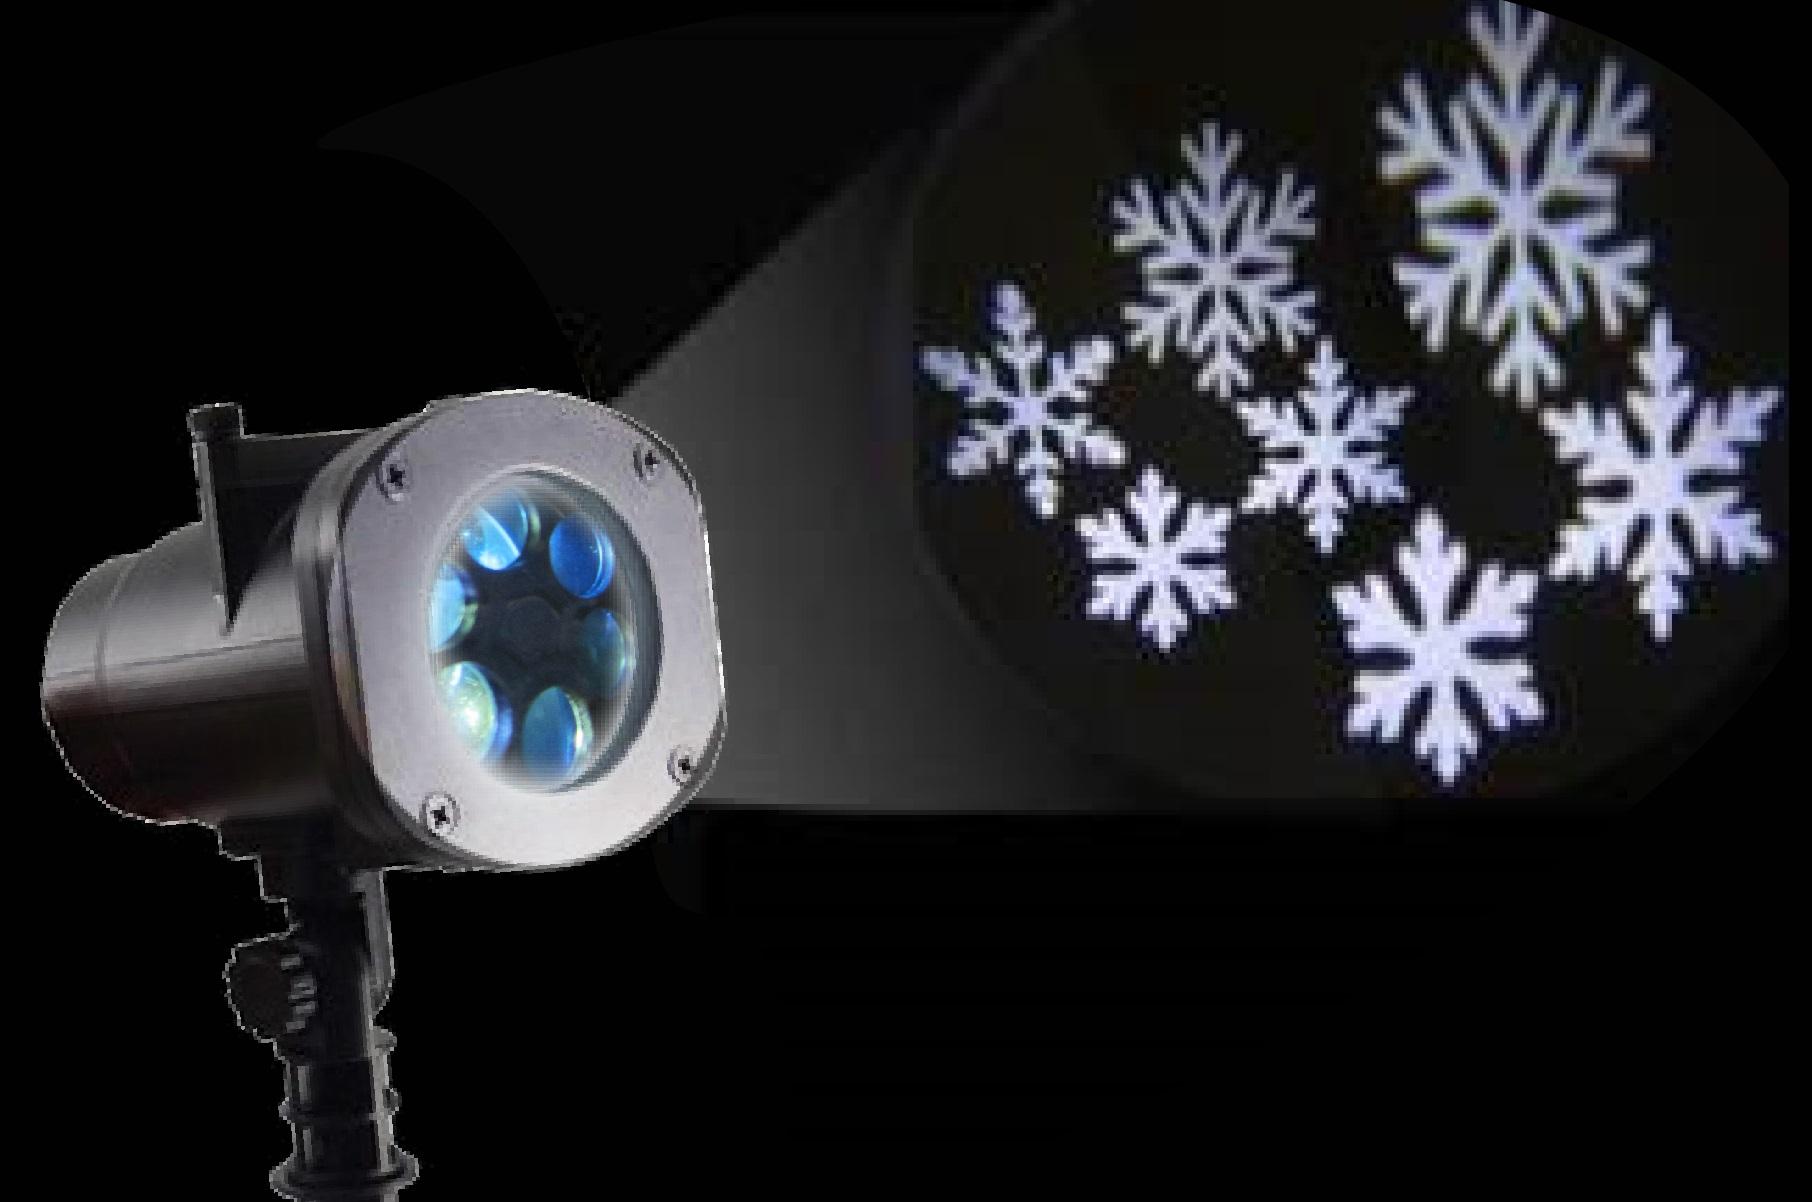 Outdoor-Projector-Snowflakes